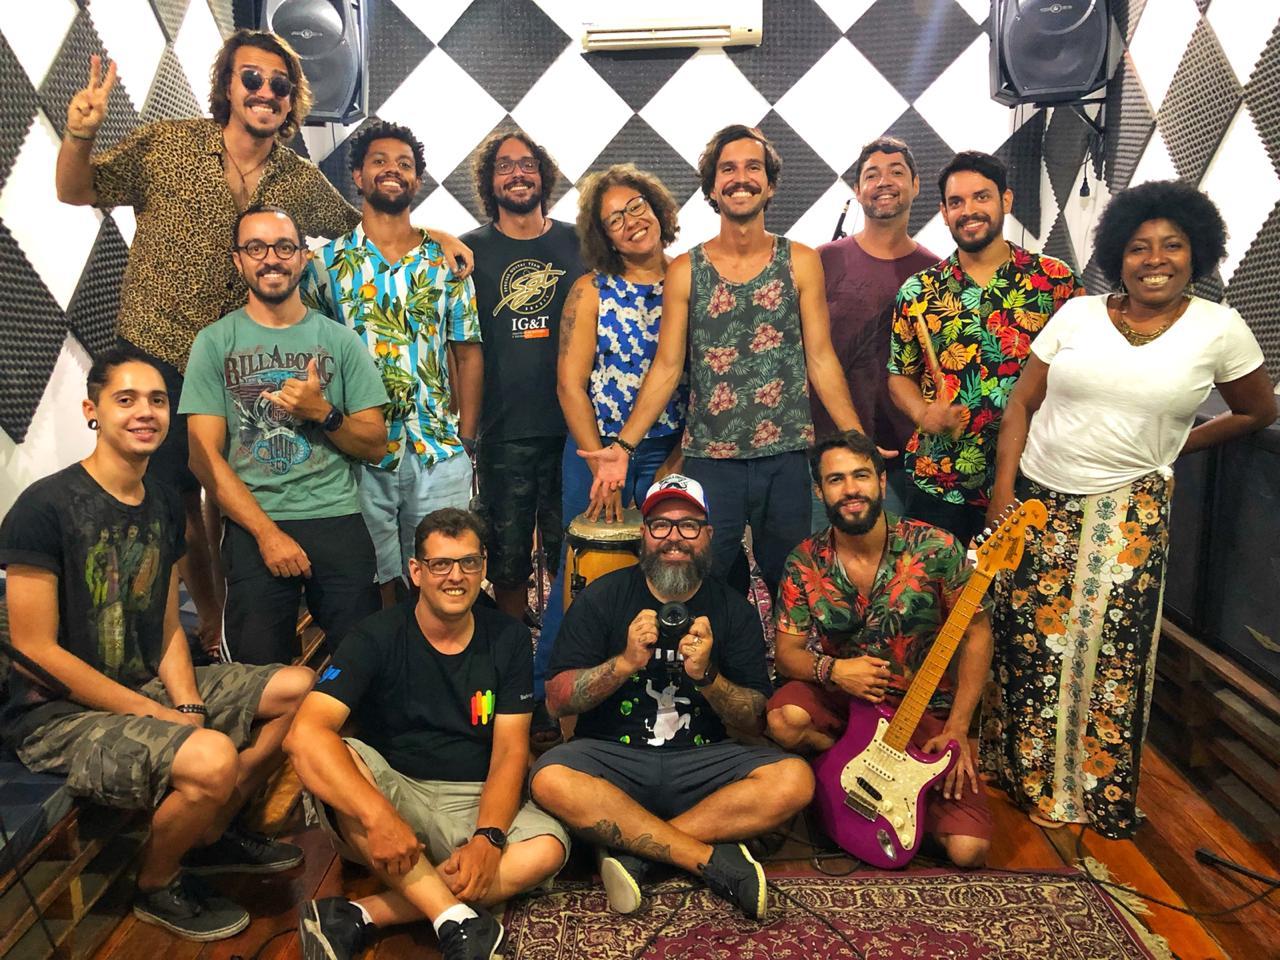 Samba do Arnesto Foto Alex Souza.jpg